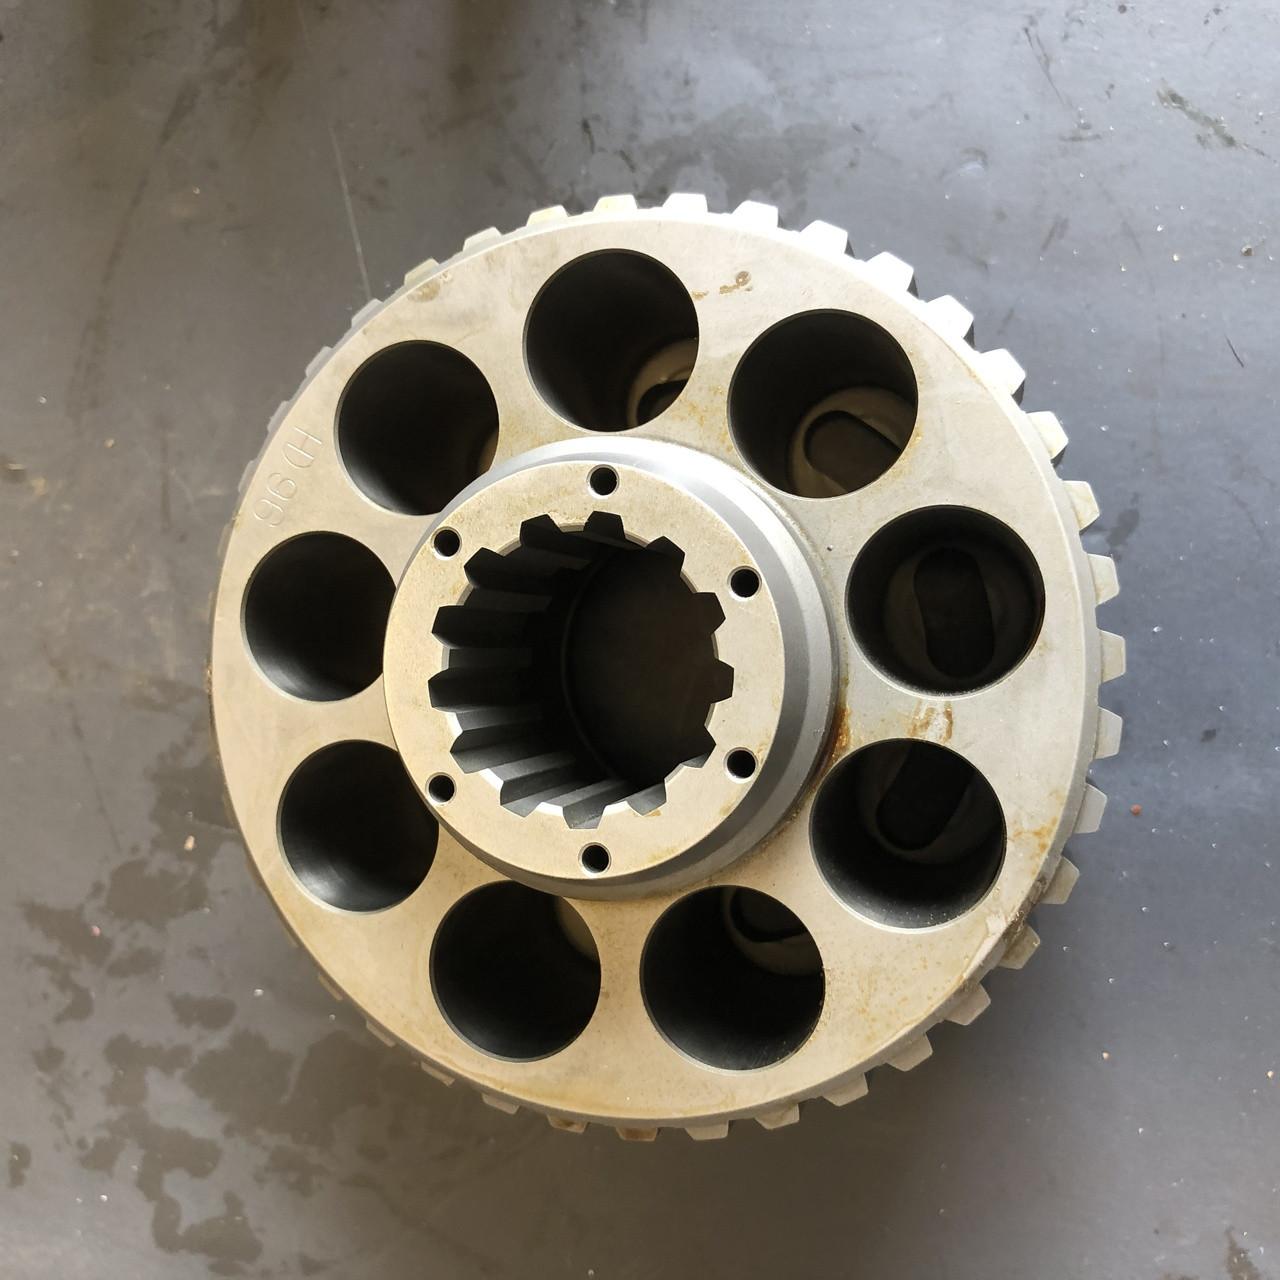 ex300-2 ex300-3 ex300-5 swing motor seal kit fits hitachi motor m2x210,ap2864